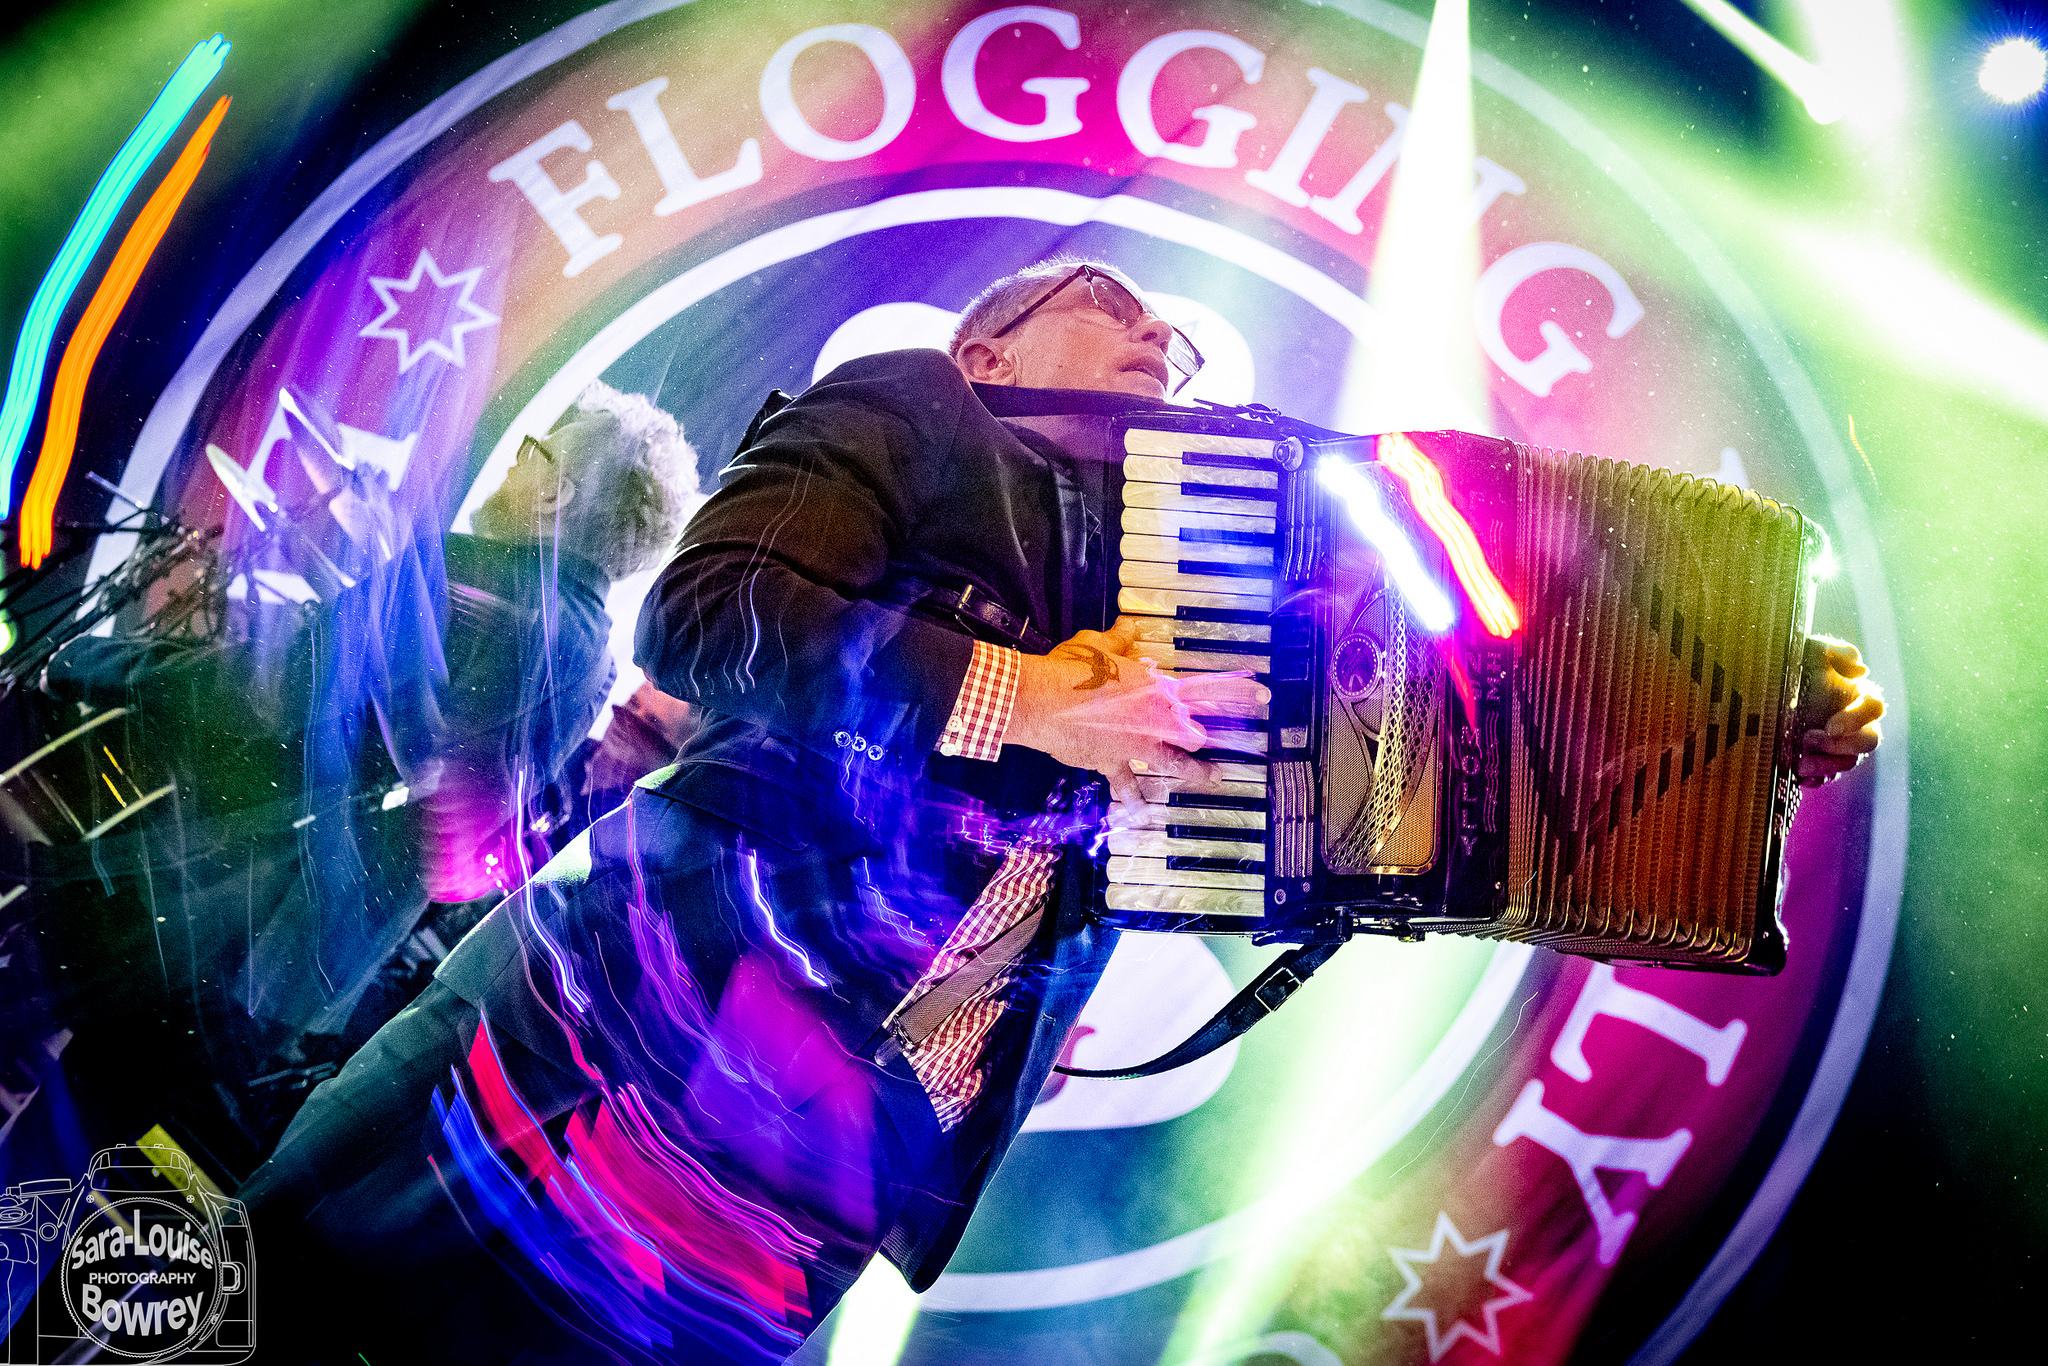 Flogging Molly – live in London, Dec 2018